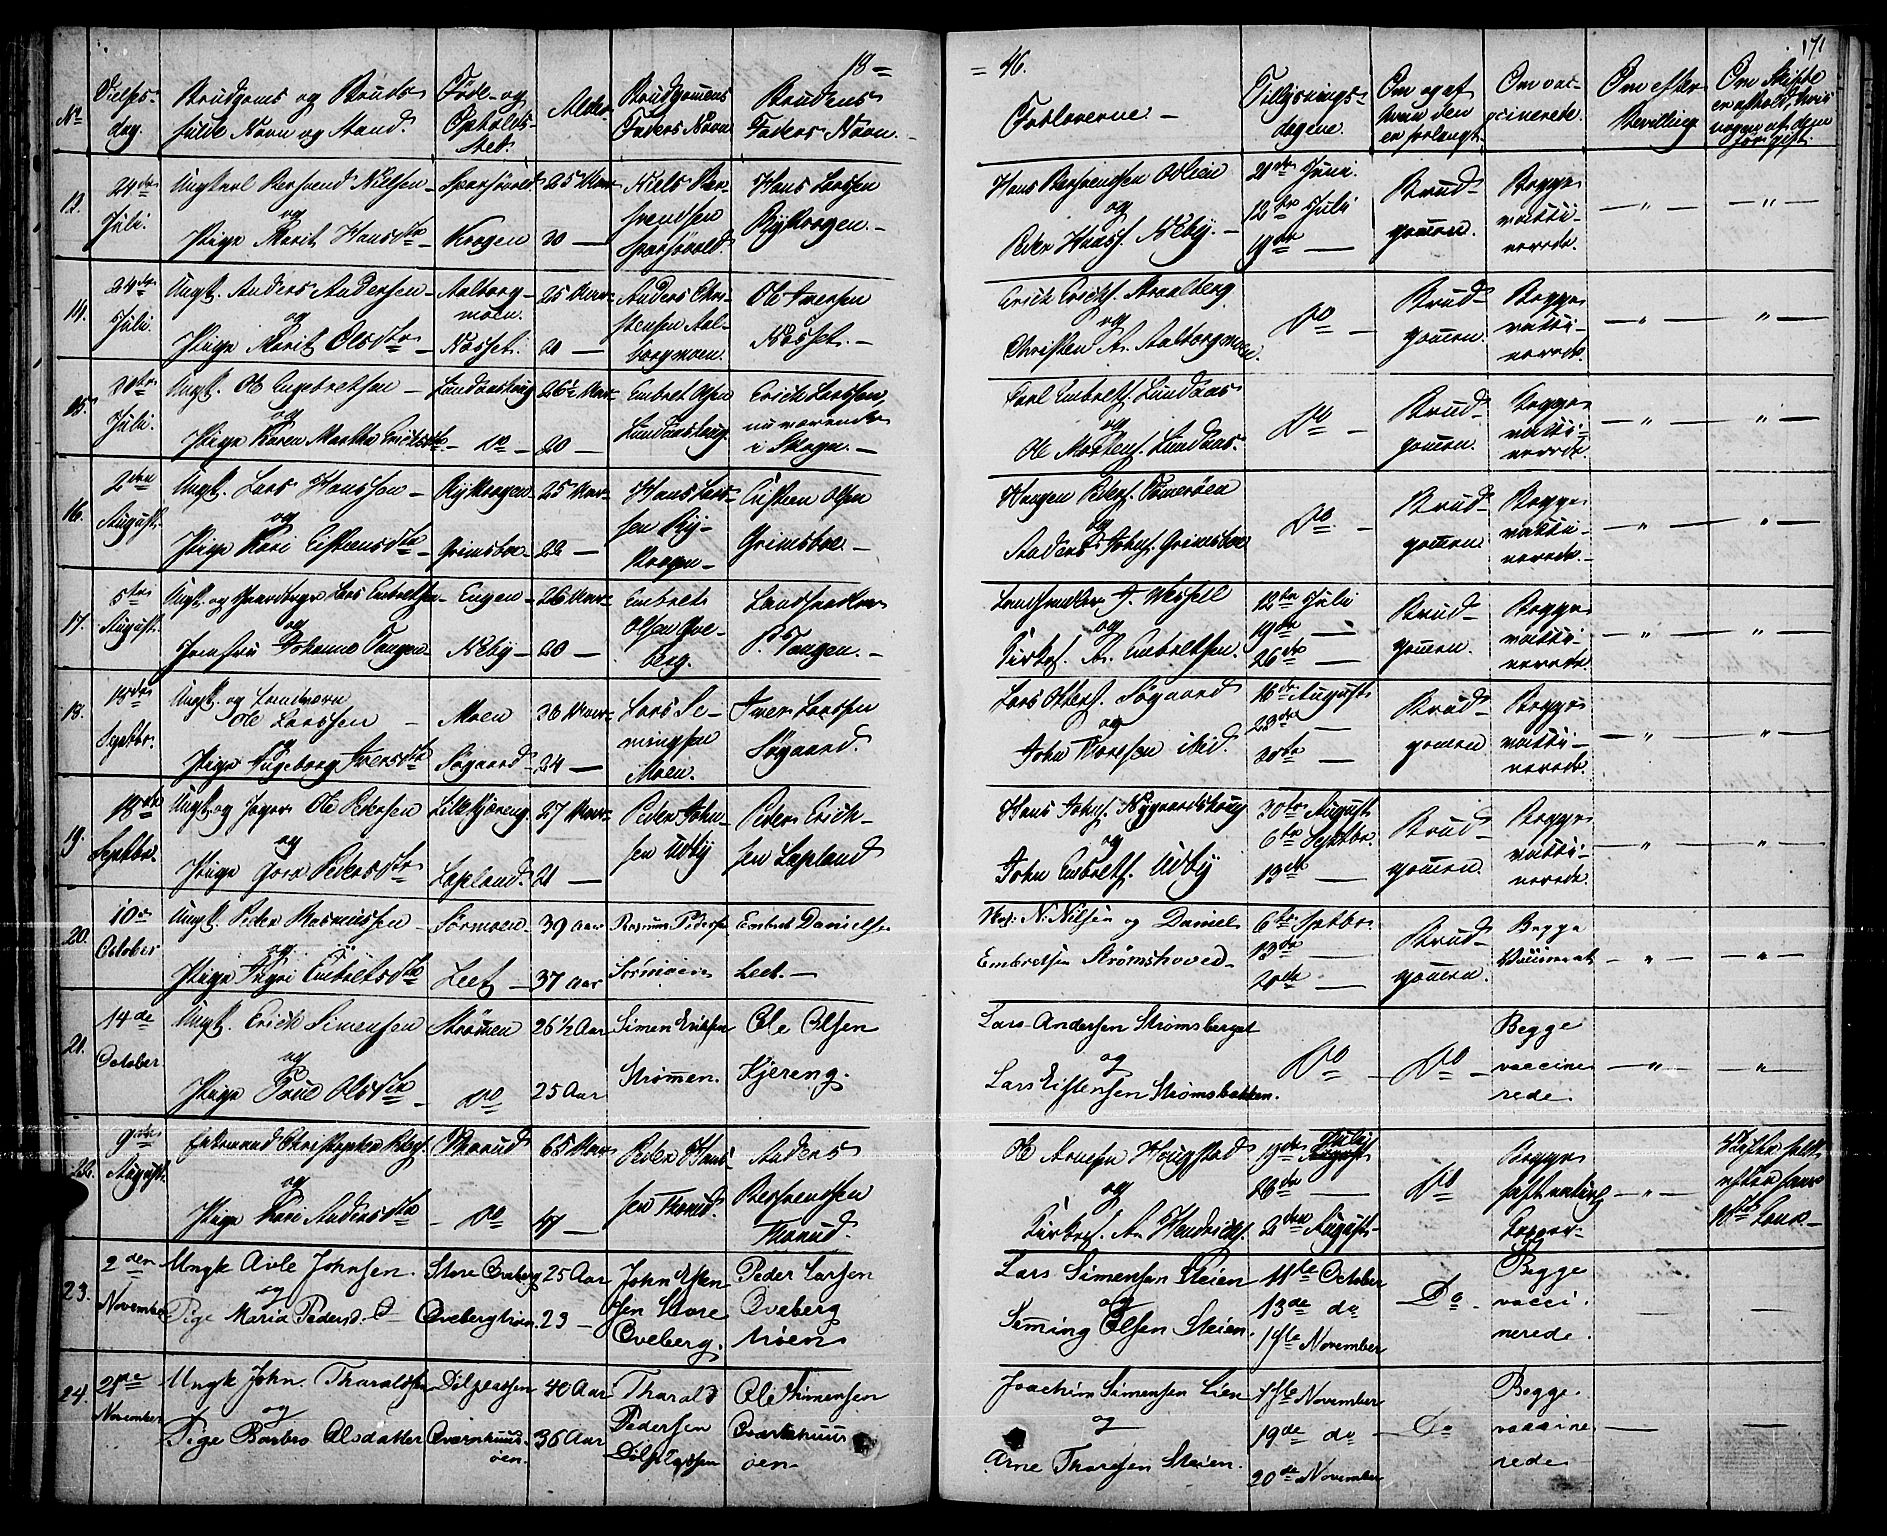 SAH, Tynset prestekontor, Ministerialbok nr. 19, 1829-1847, s. 171